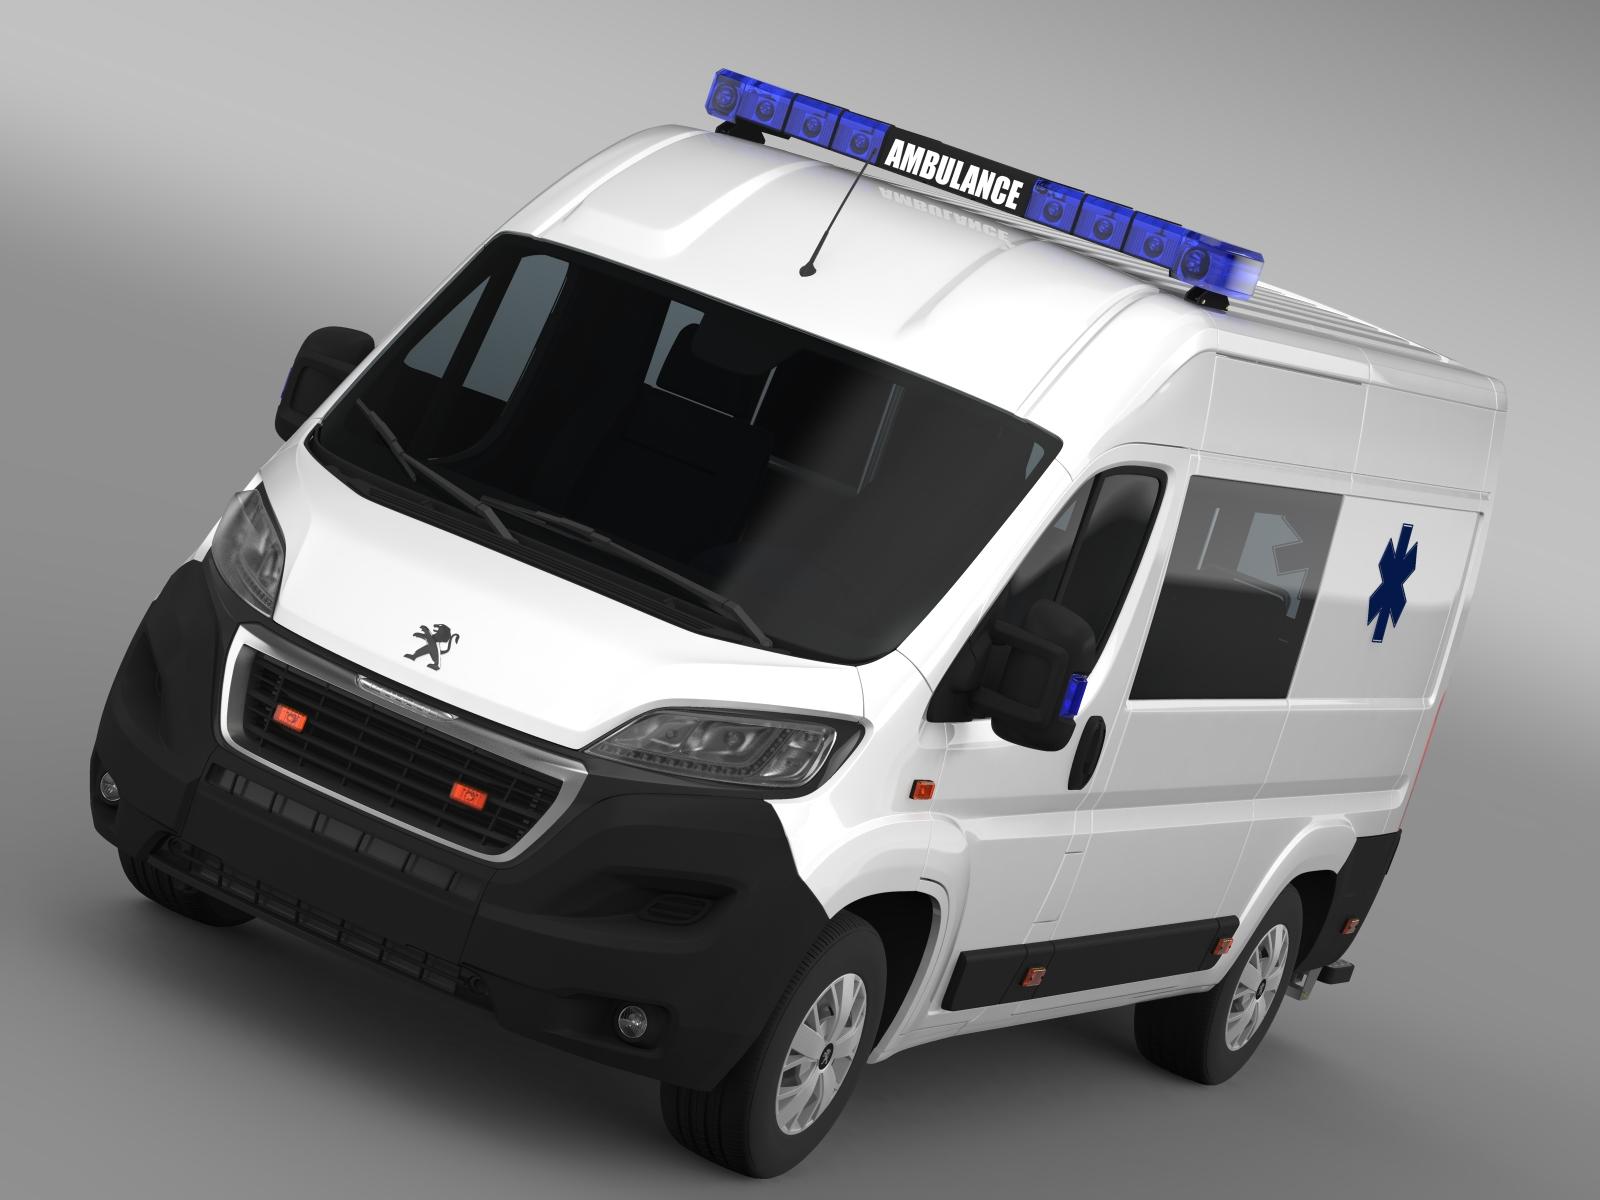 Peugeot boksçu ambulans 2015 3d modeli 3ds max fbx c4d lwo ma mb hrc xsi obj 208871